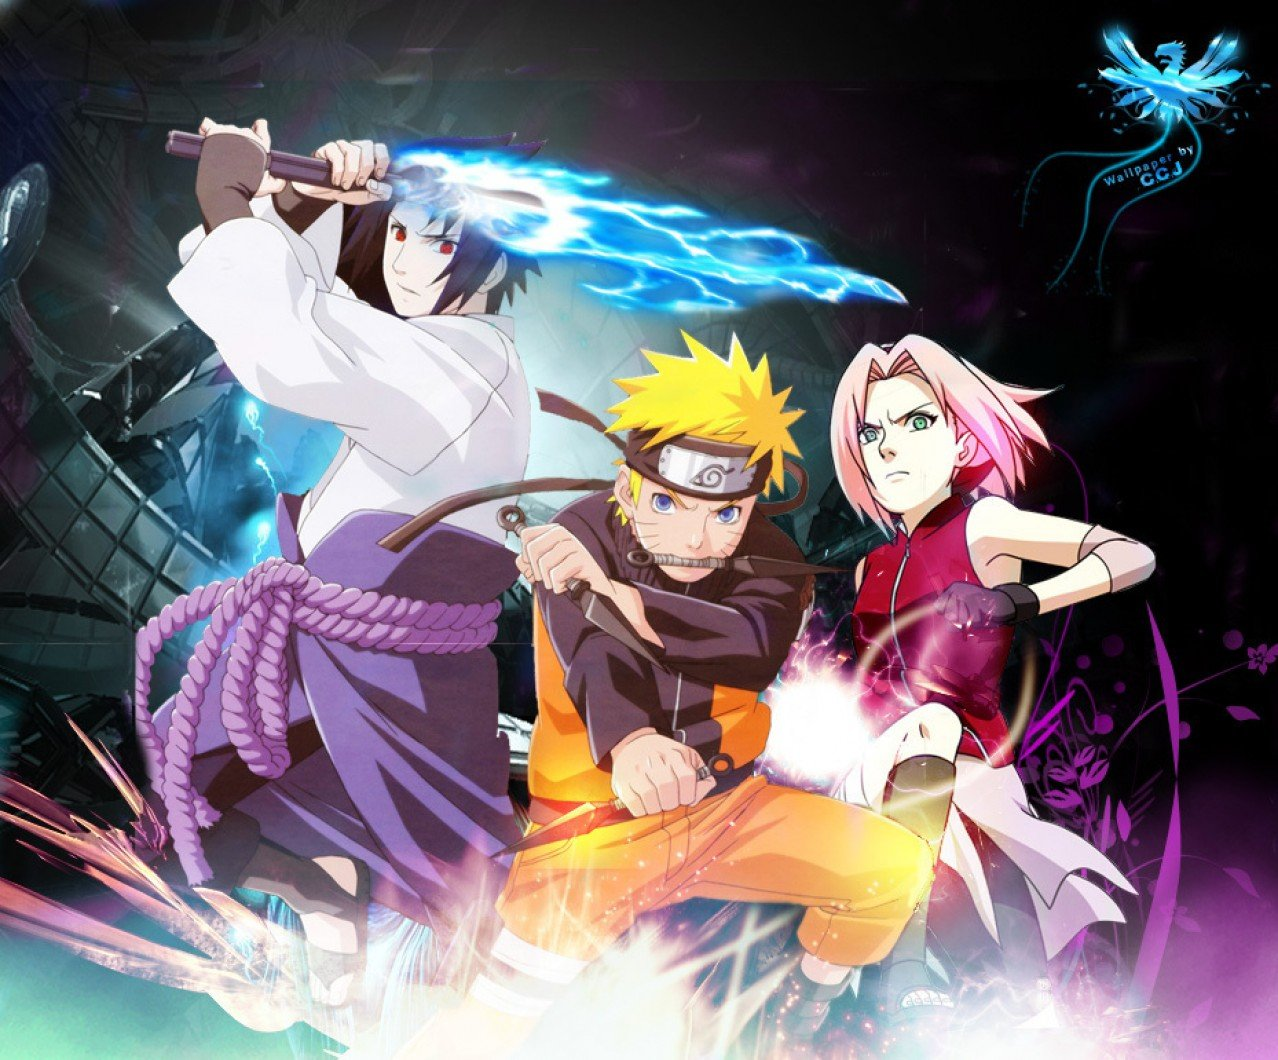 Free Download Image For Naruto Shippuden Sakura Desktop Hd